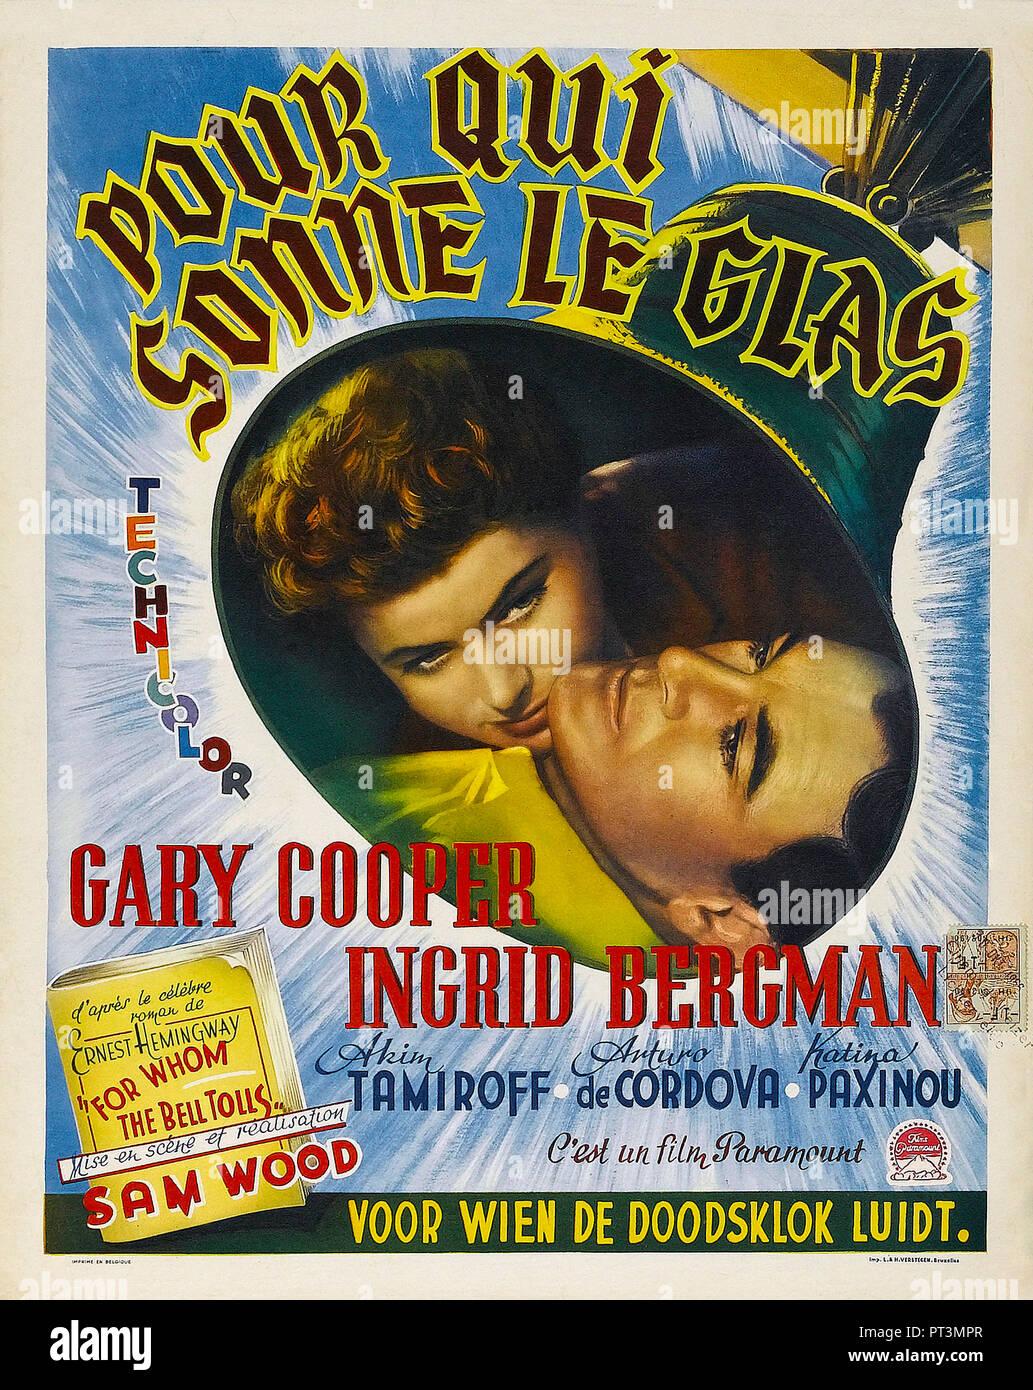 Prod DB © Paramount Pictures / DR POUR QUI SONNE LE GLAS FOR WHOM THE BELL TOLLS de Sam Wood 1942 USA affiche belge Ingrid Bergman Gary Cooper d'apres - Stock Image